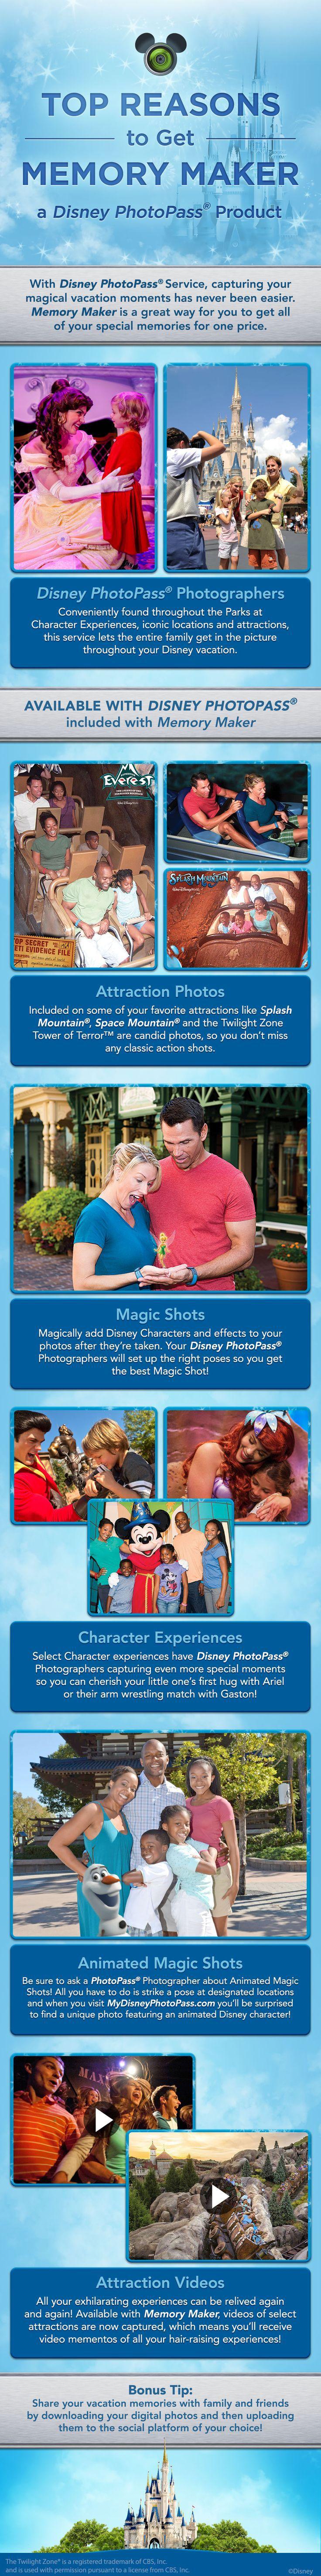 10 Reasons Why You Should Invest in Disney's Memory Maker http://www.magicplanning.com/?p=417 #disney #disneysecrets